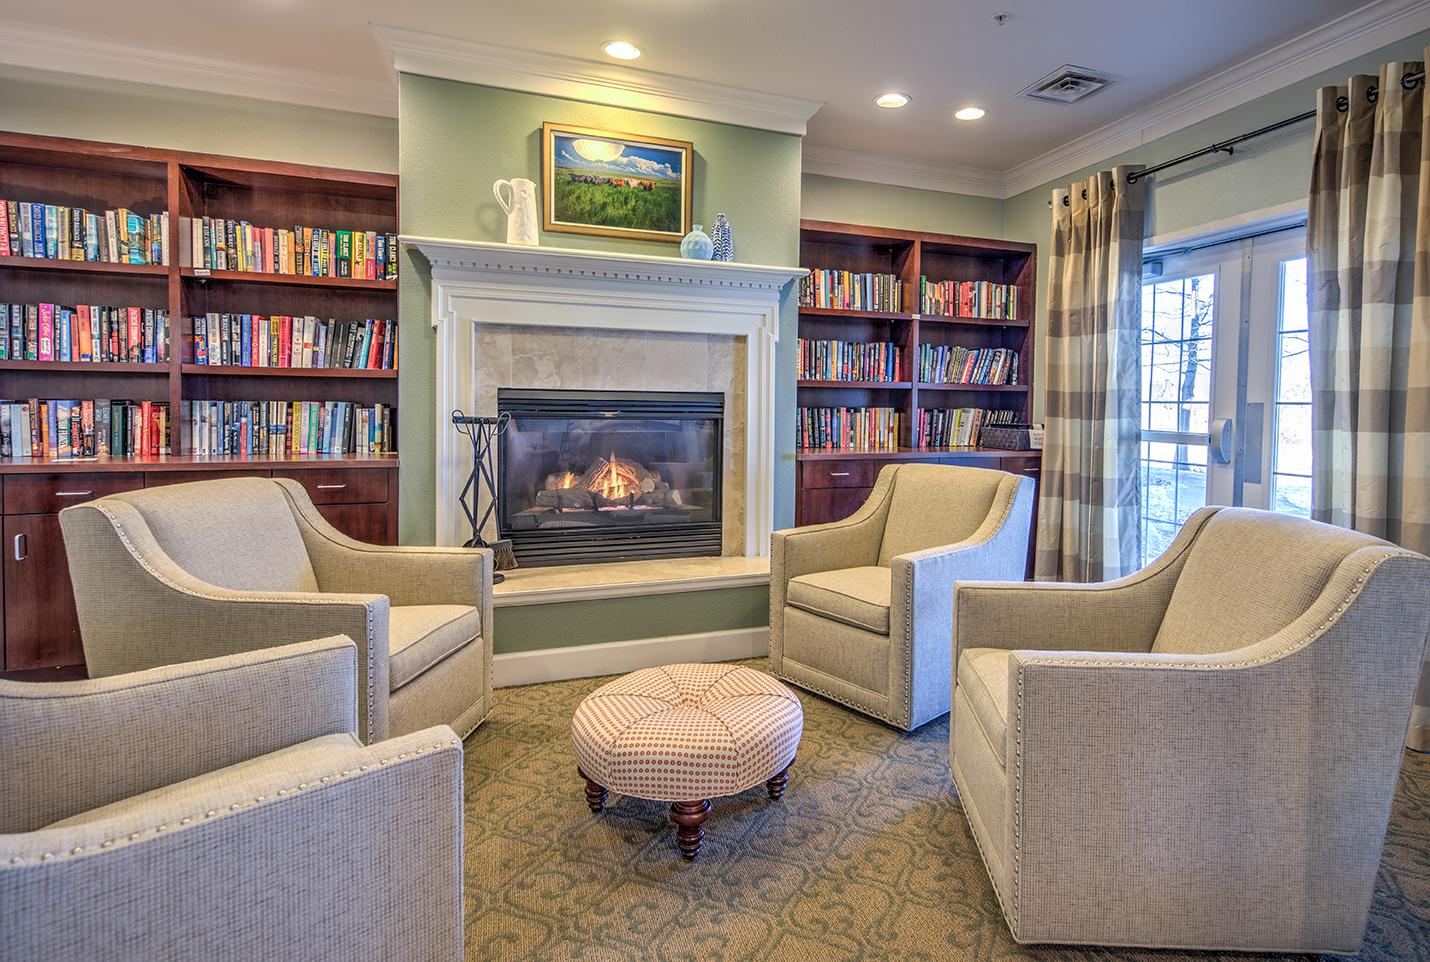 community ammenities library senior living rental communities Denver